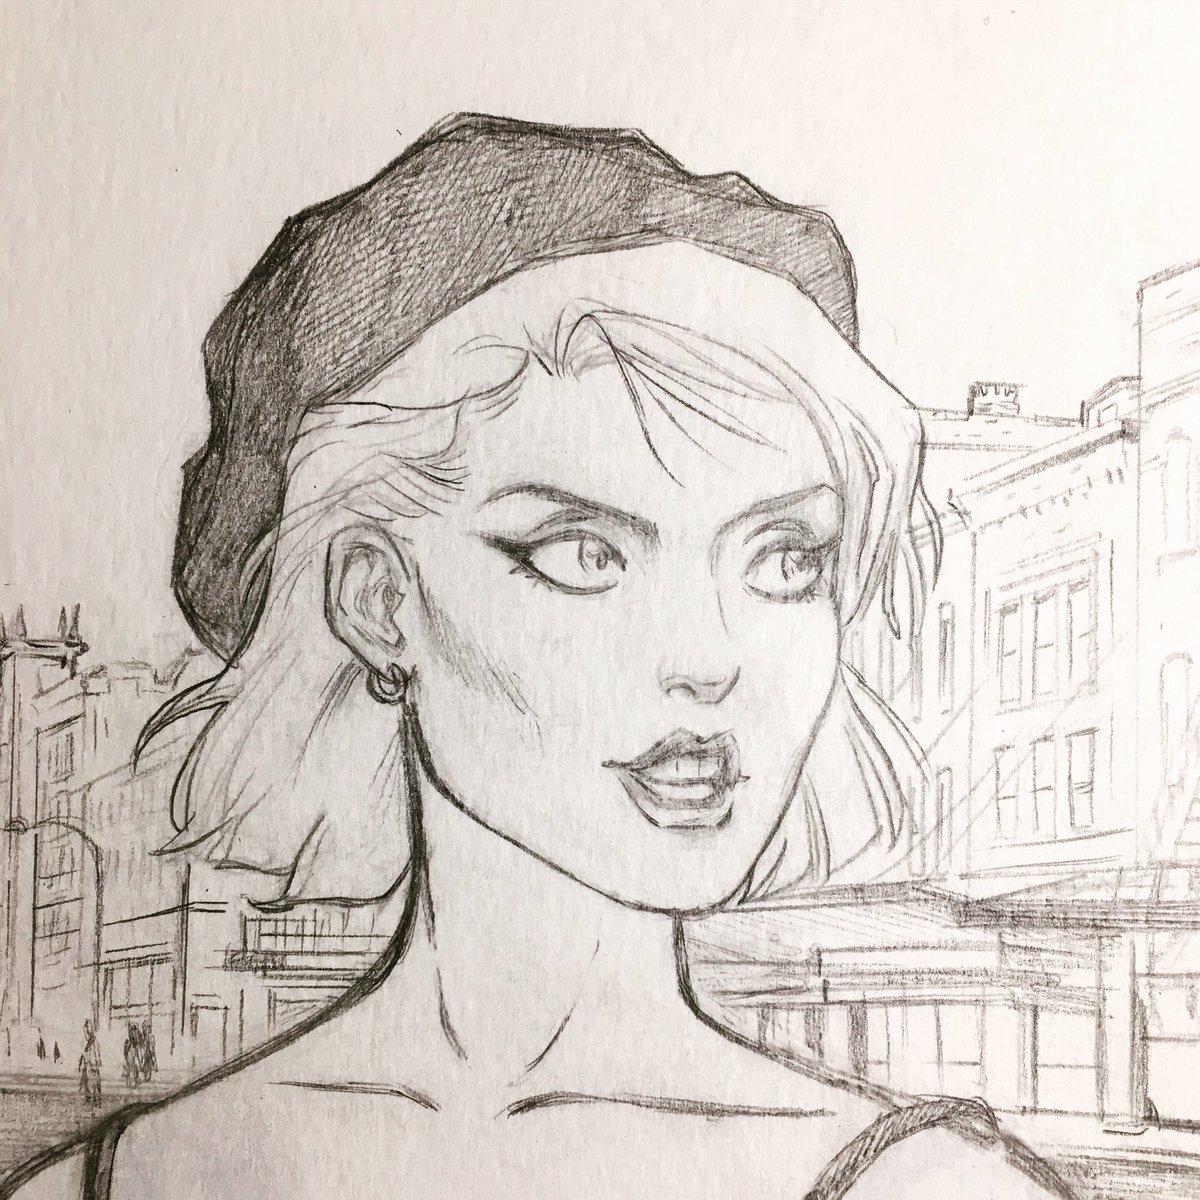 Sunday Girl on a Monday Morning: work in progress on Deborah Harry. #Blondie #DeborahHarry #debbieharry #newwave #punk #womenofpunk pic.twitter.com/dA8HS9X85P